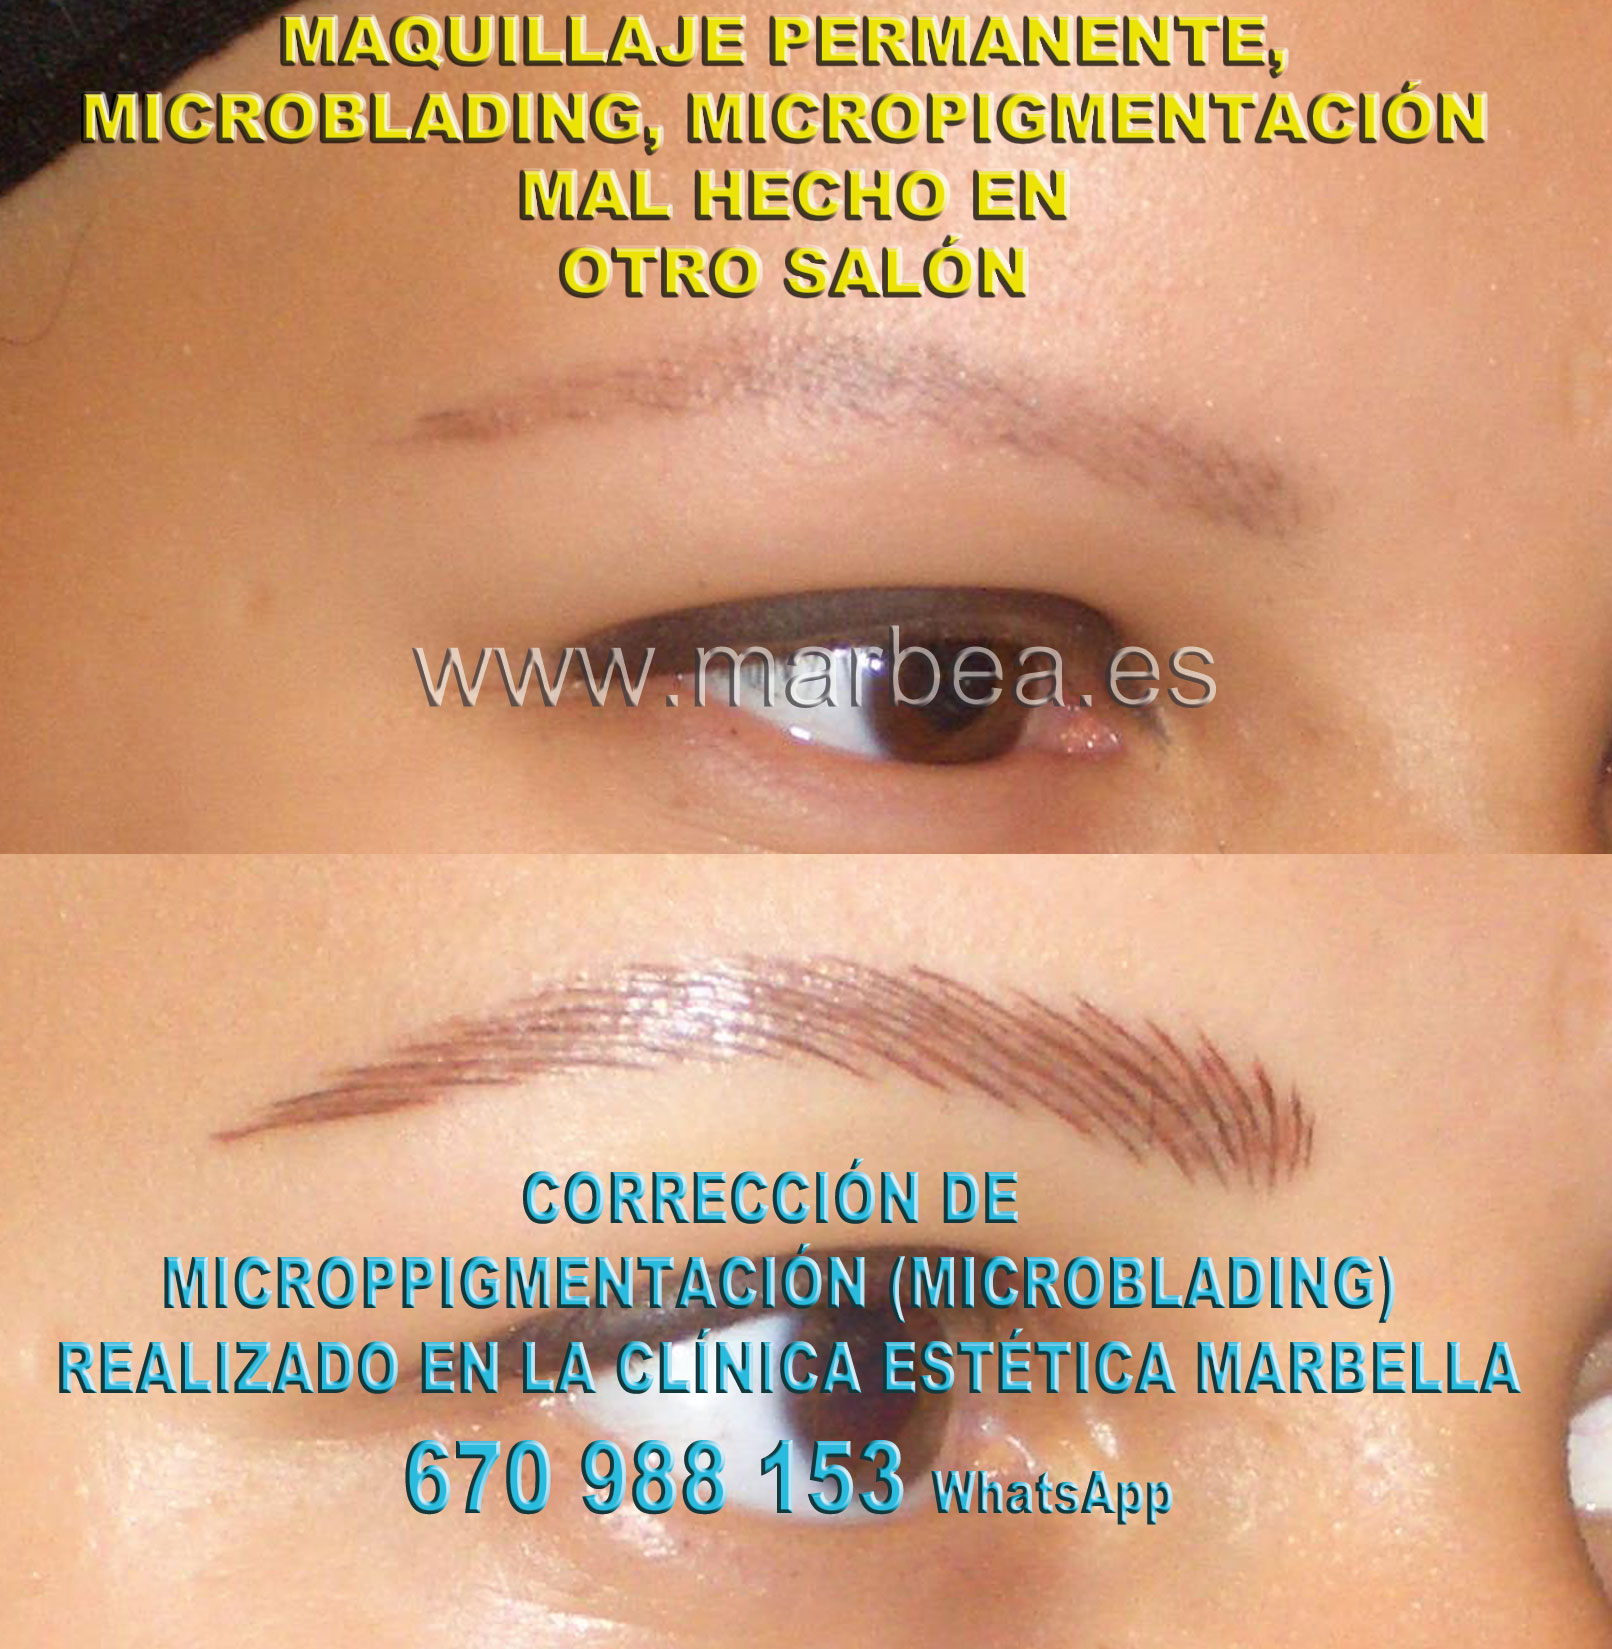 ELIMINAR TATUAJE CEJAS clínica estética tatuaje ofrece micropigmentacion correctiva de cejas,reparamos microppigmentacion mal hechos